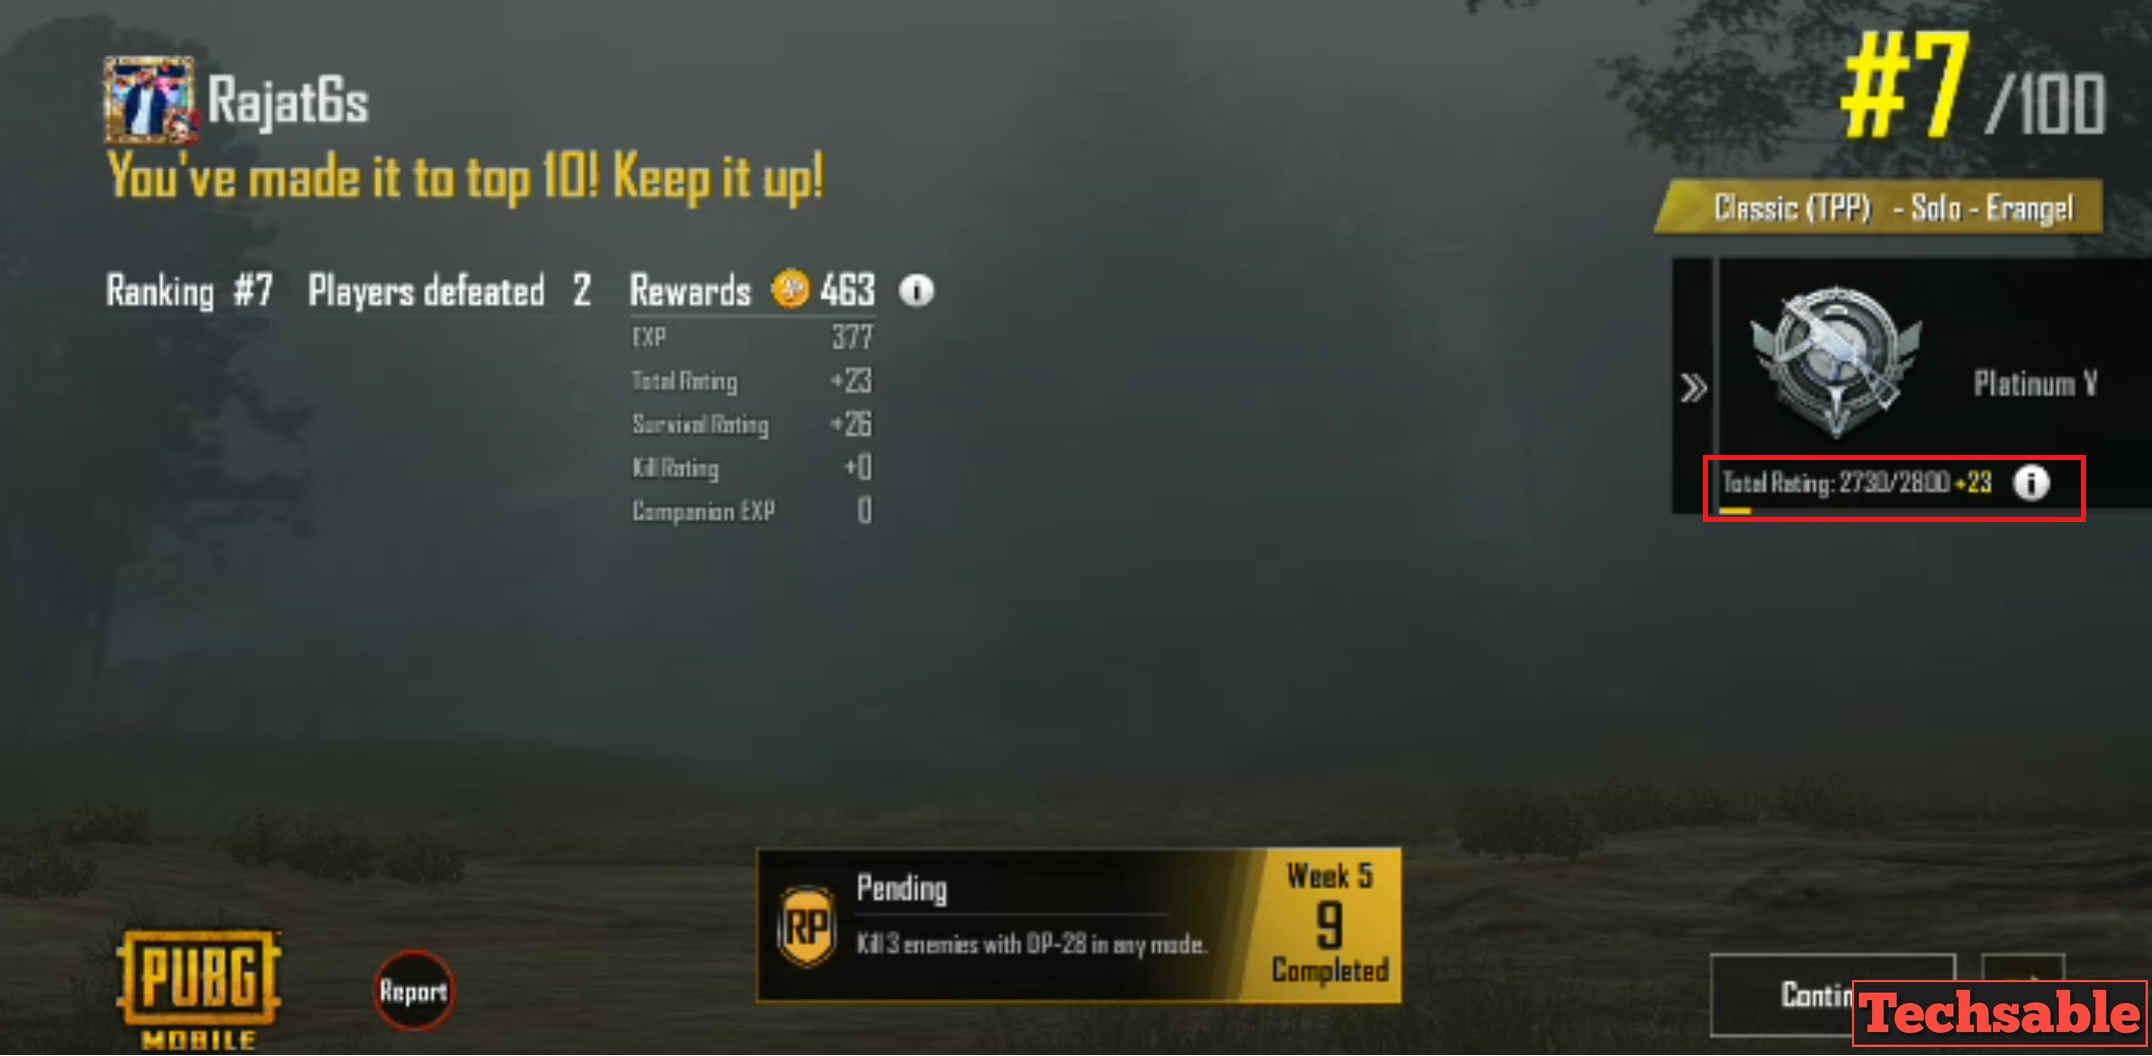 pubg mobile rank up points